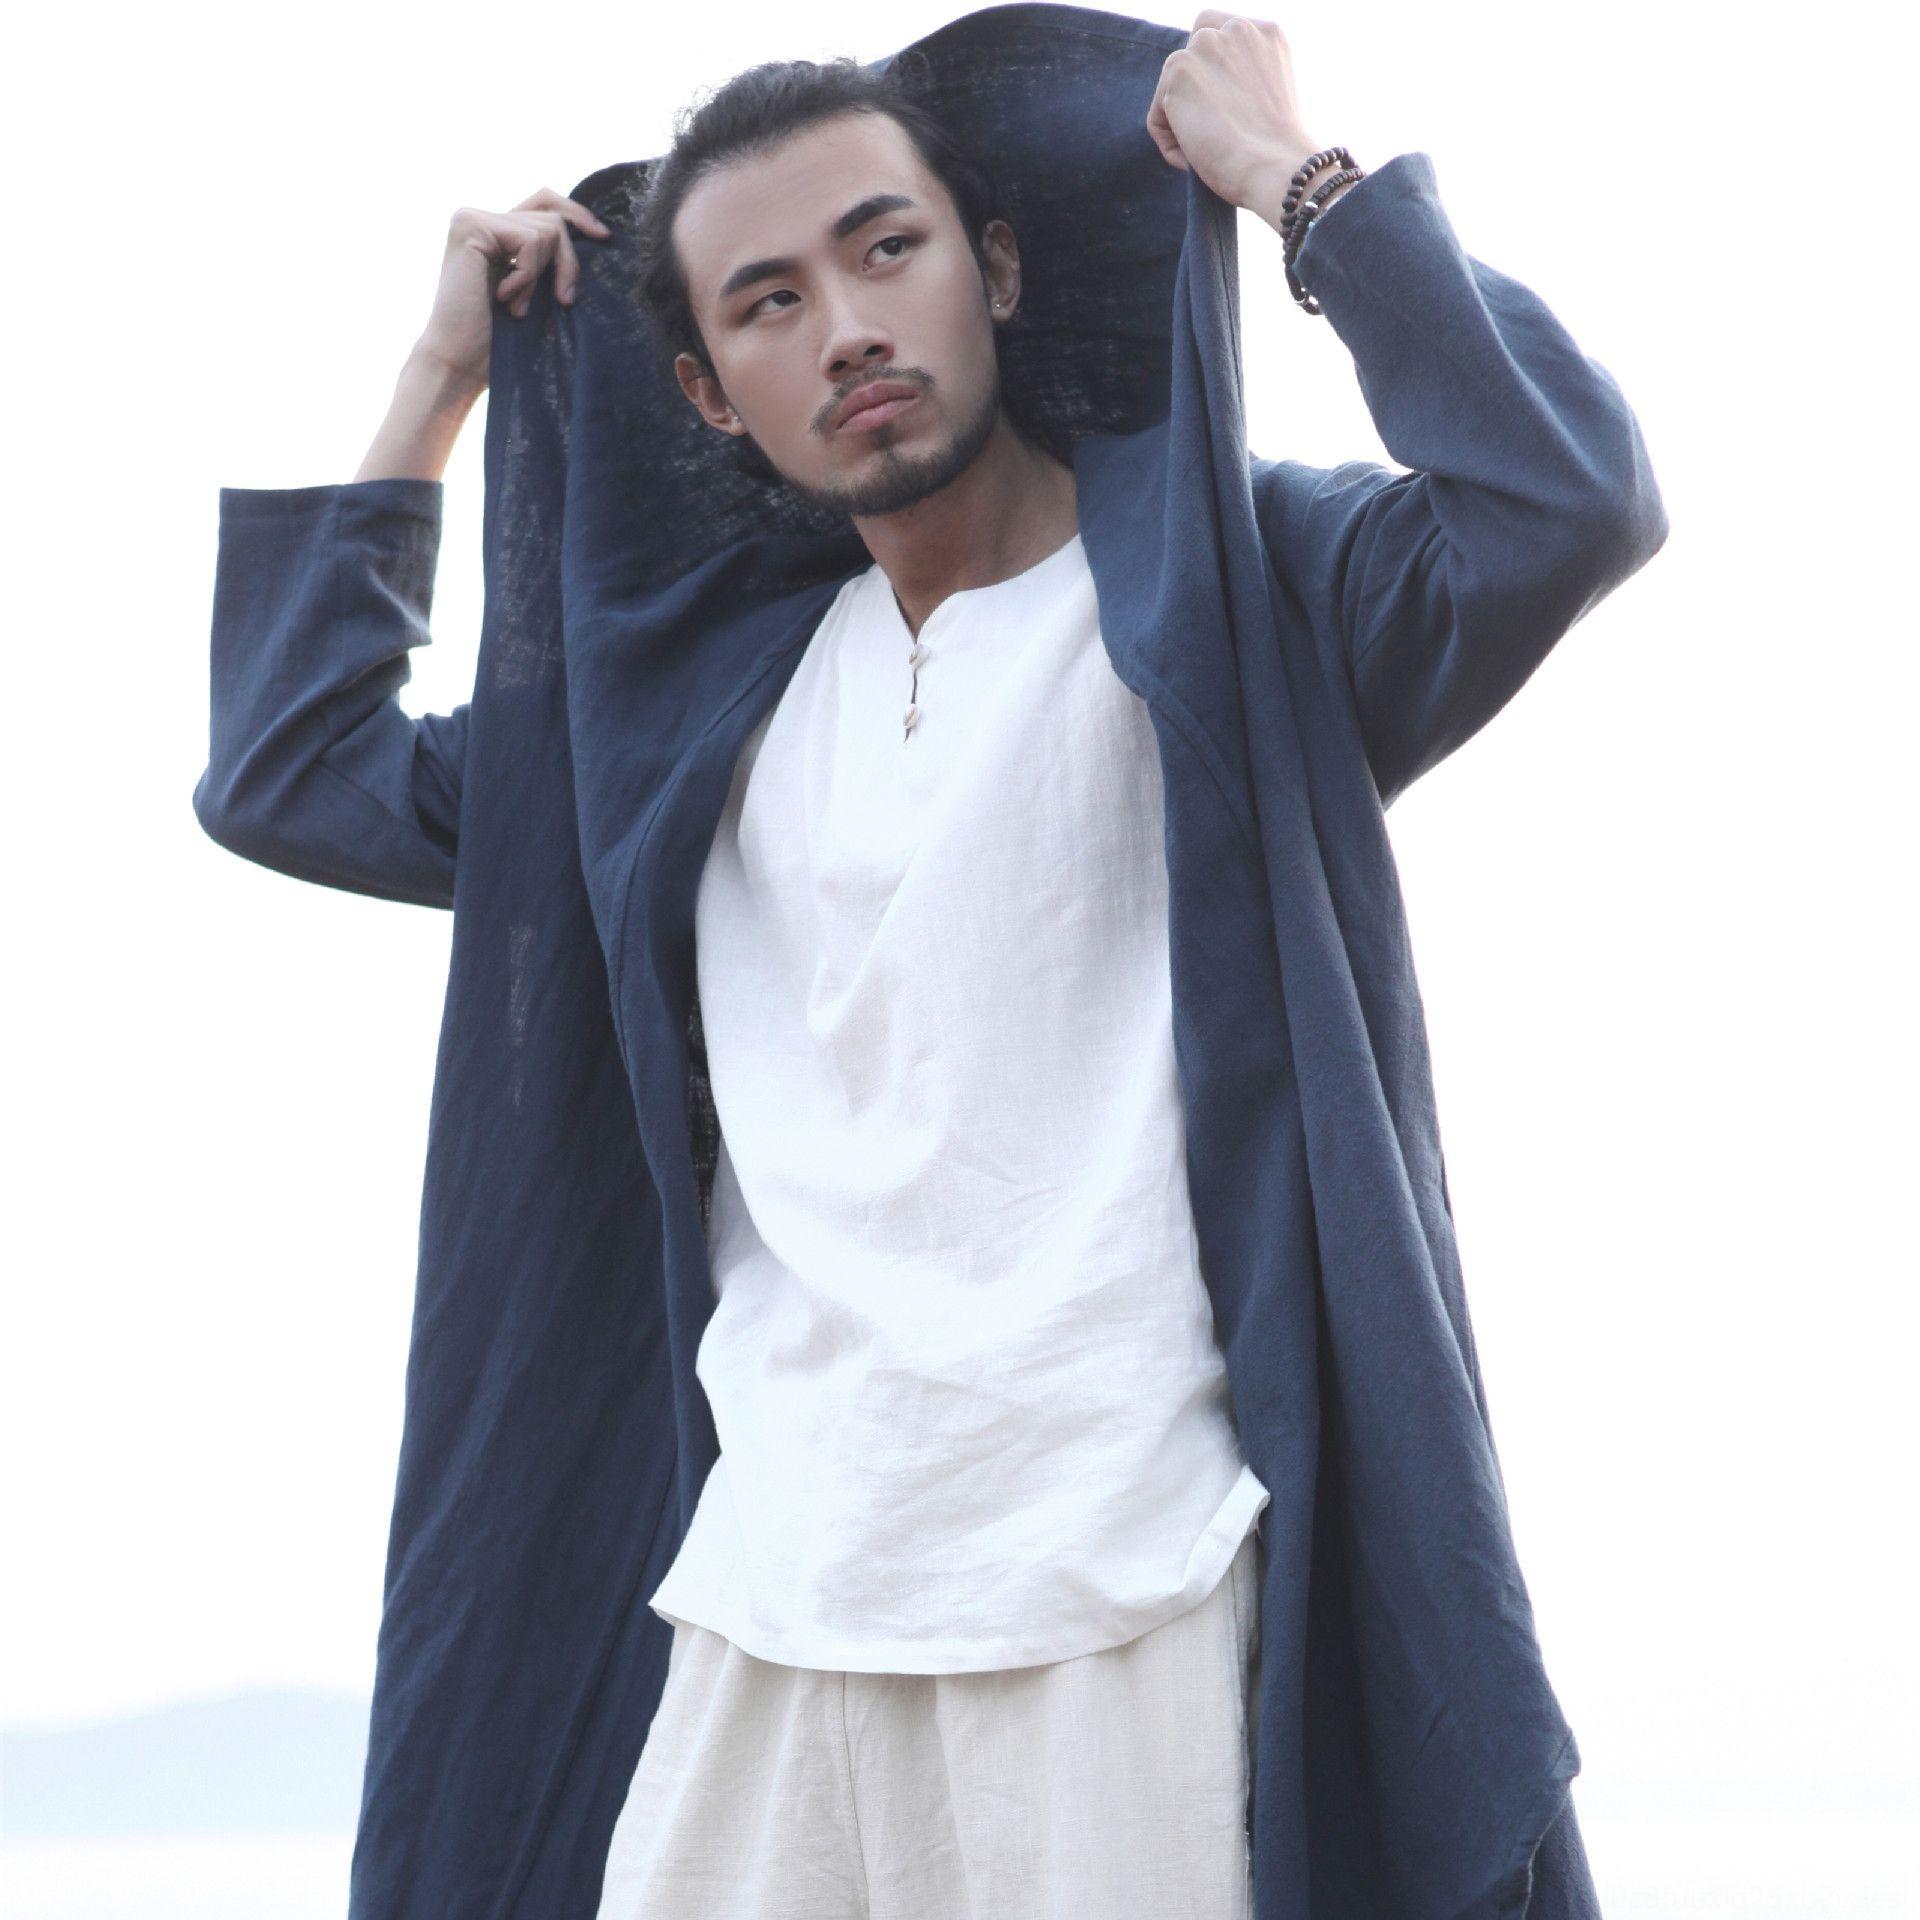 20 New mafan men's and big cloak Ramie long coat Cloak cotton linen Coat cotton and linen leisure travel overcoat